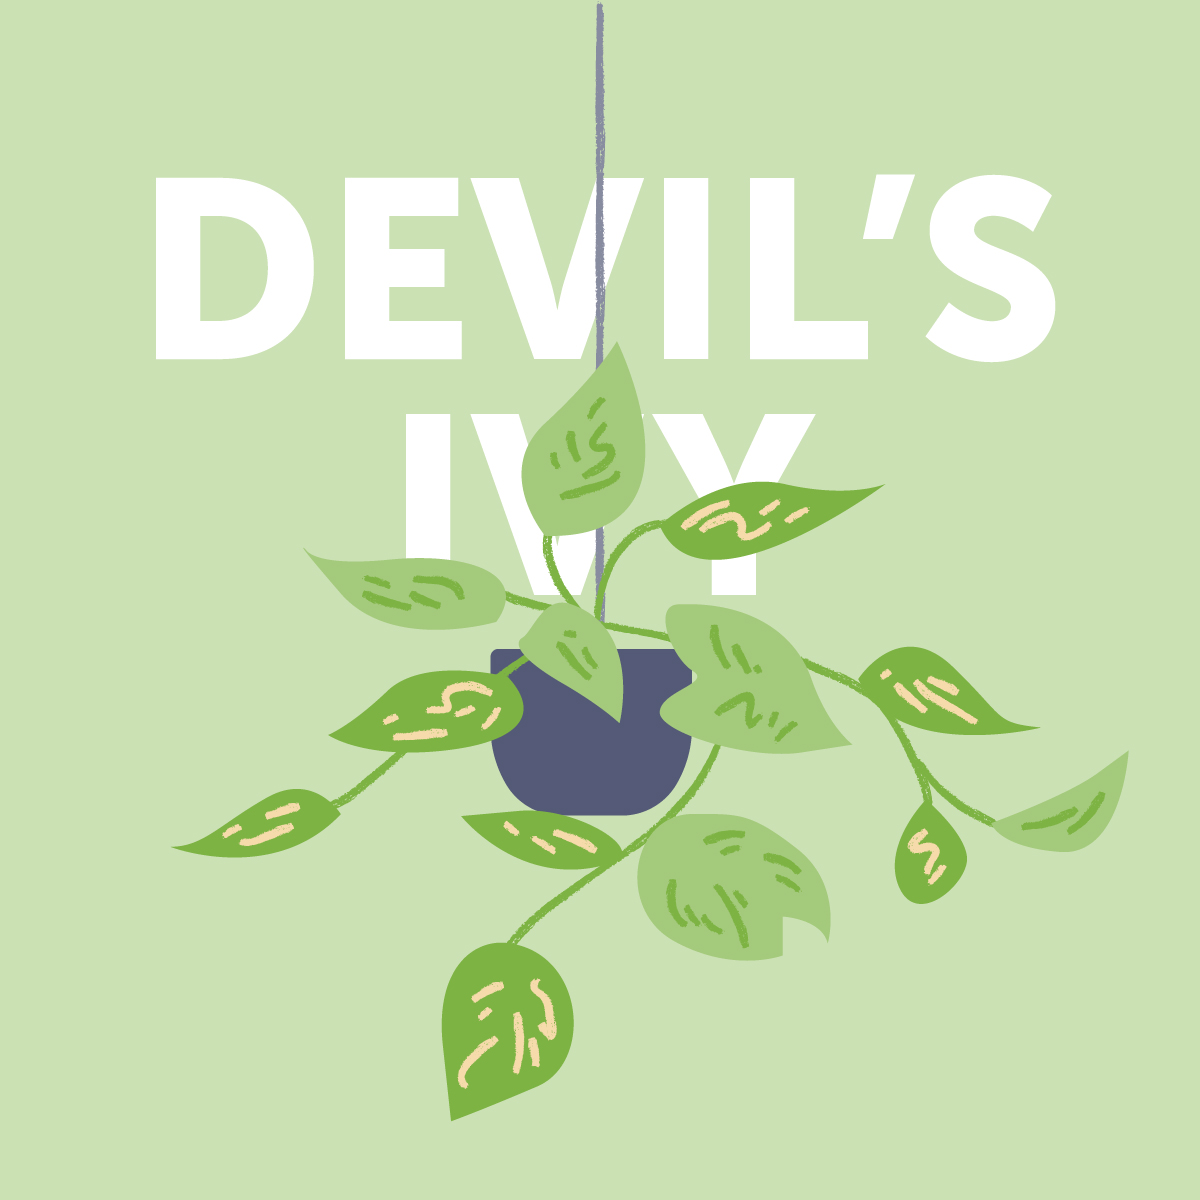 Devil's ivy indoor plant | Airtasker Life Skills